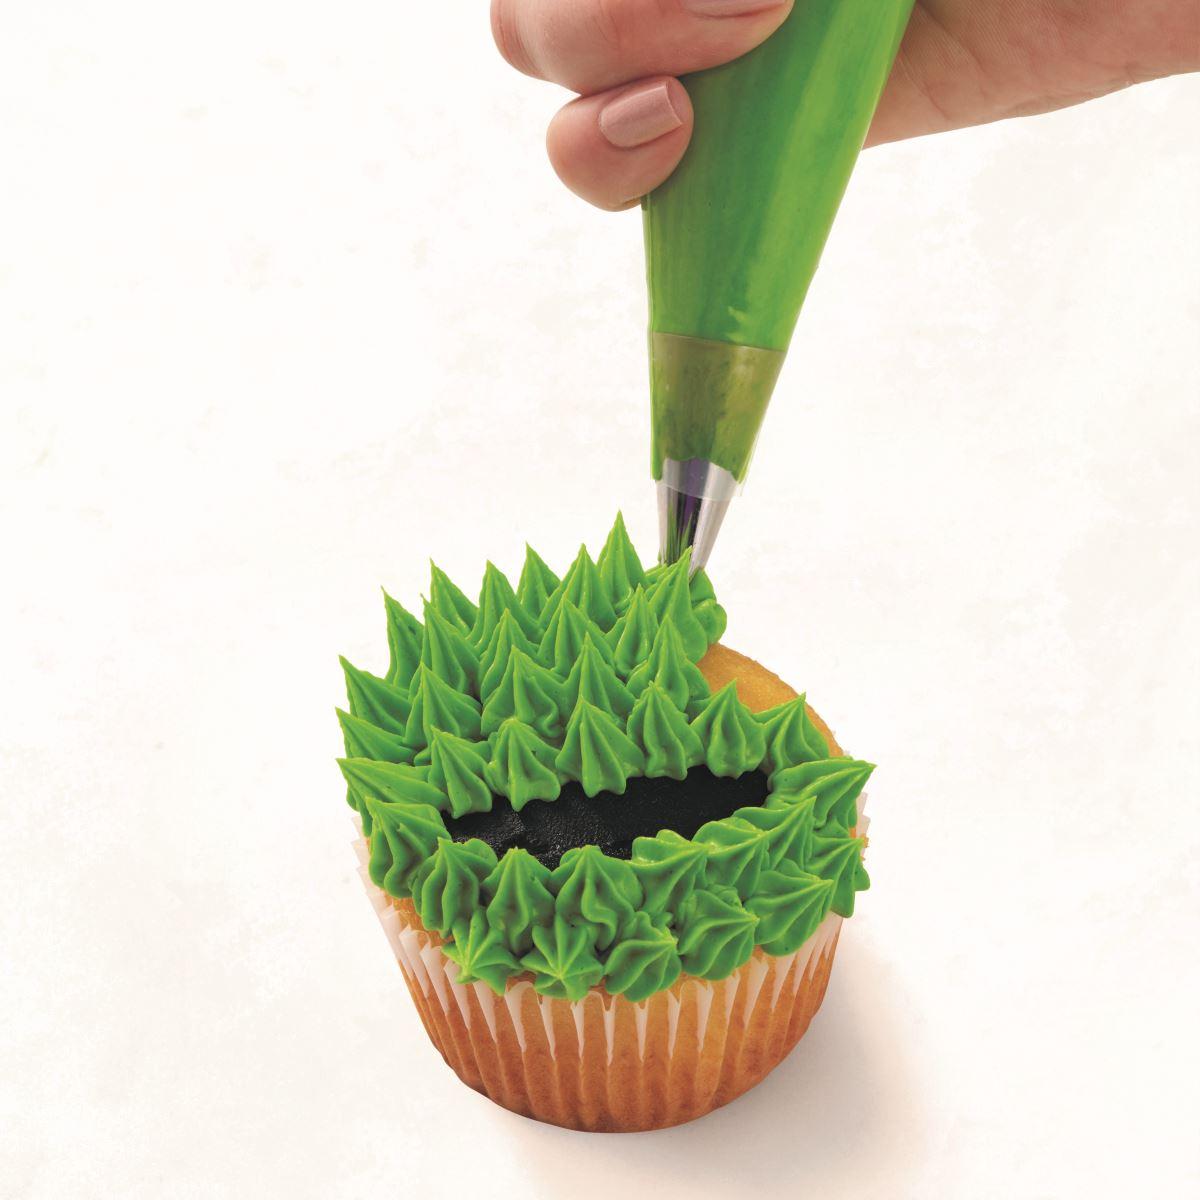 GREEN MONSTER CUPCAKE step 3